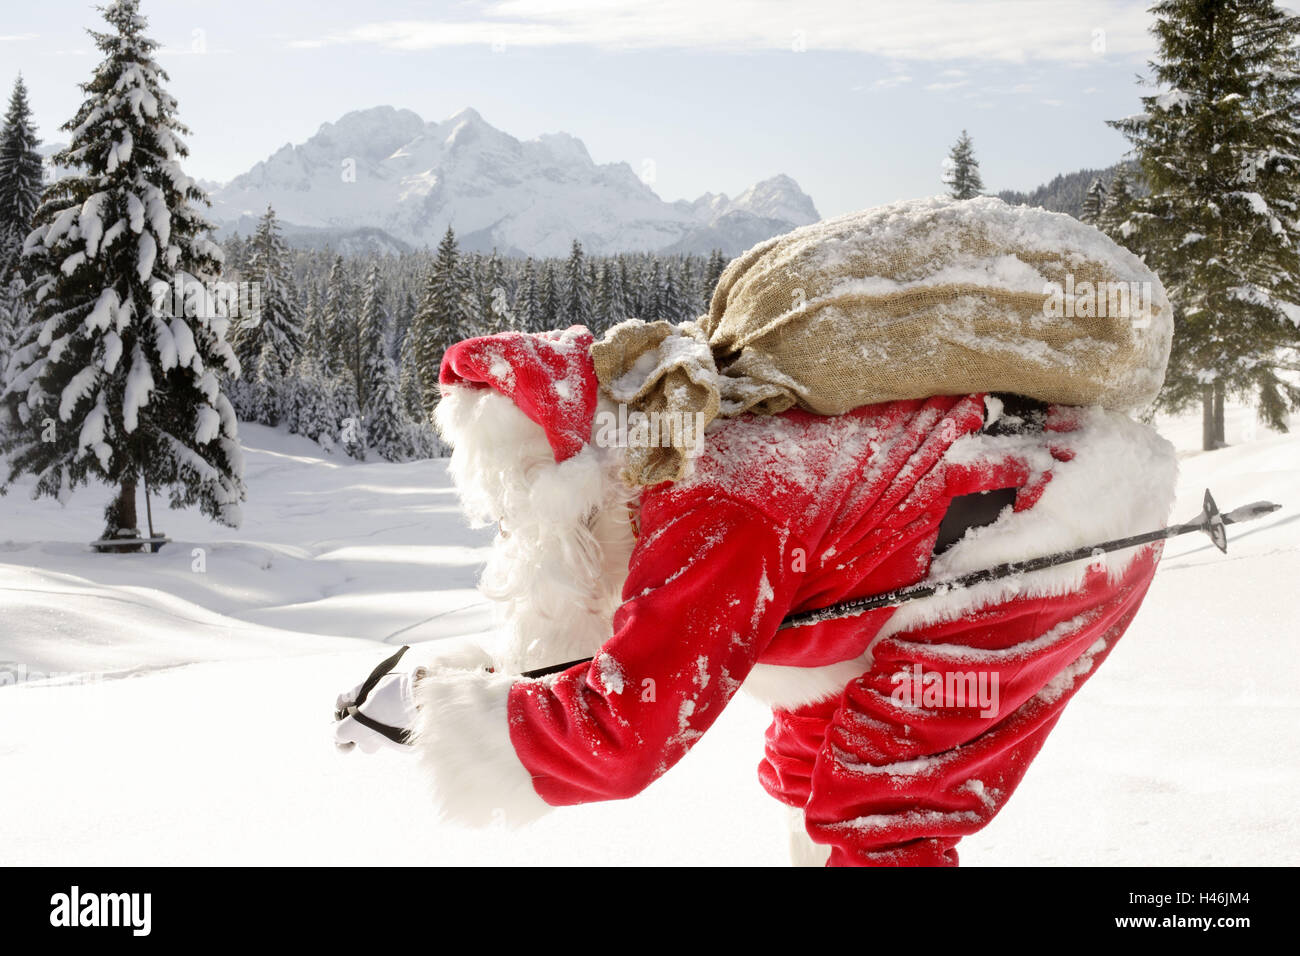 Image Pere Noel En Ski.Santa Claus Skis Celerite Pochette Presente Paysage D